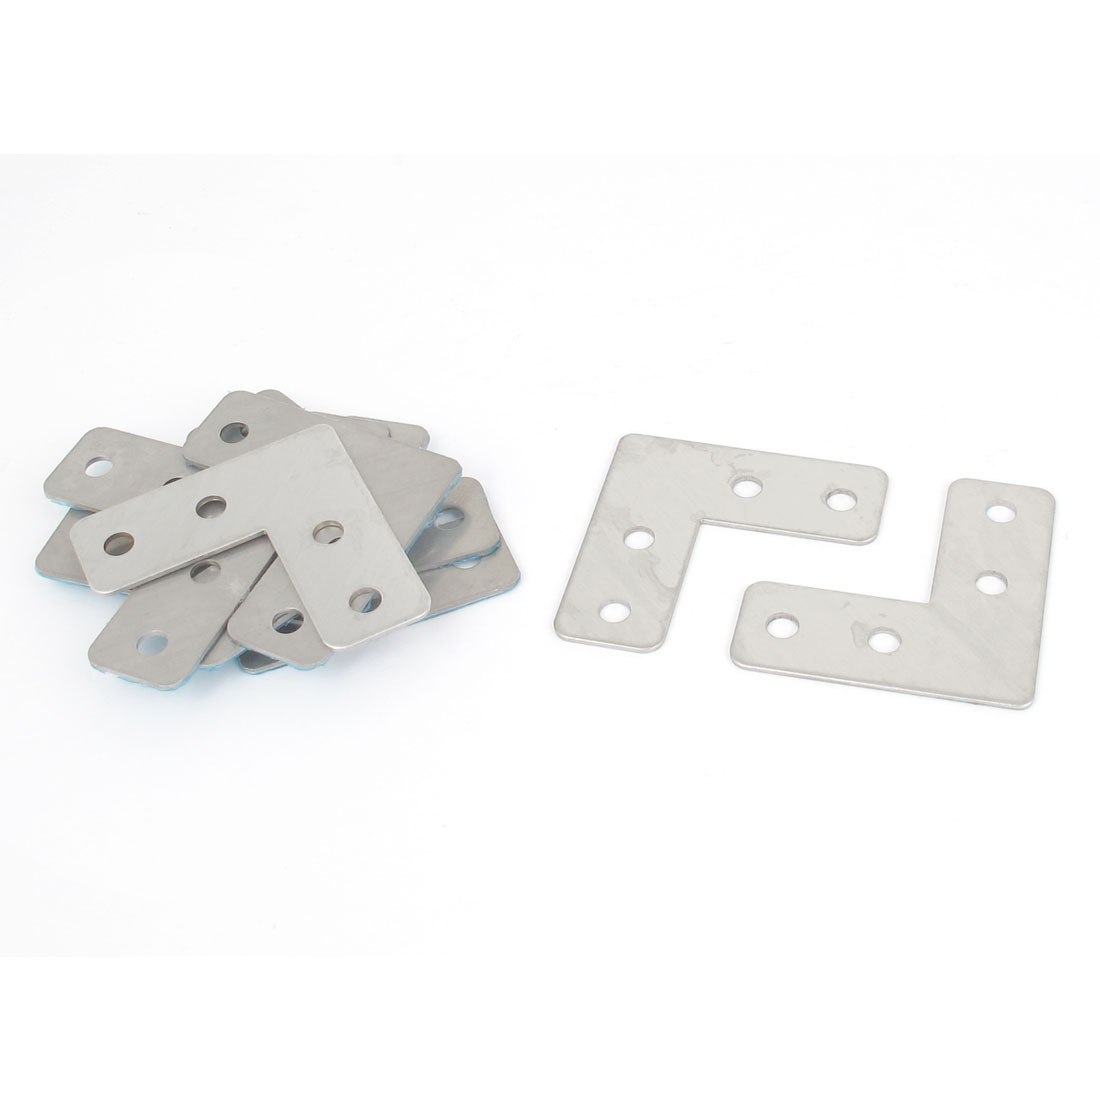 40mmx40mm Flat L Shape Corner Brace Fixing Repair Plate Right Angle Bracket 10pcs